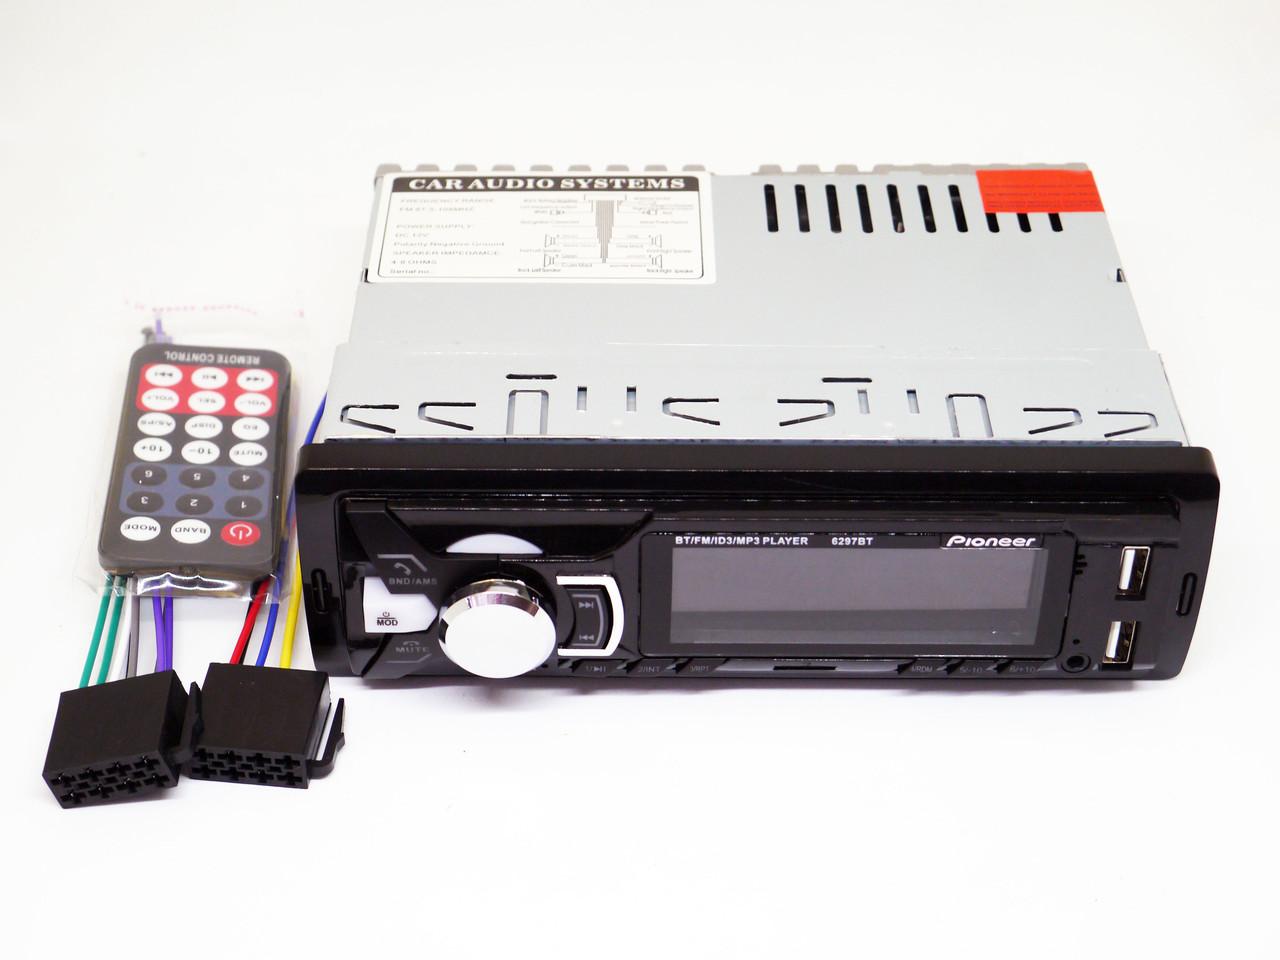 Автомагнитола Pioneer 6297BT Bluetooth+2xUSB+SD+AUX 4x50W - Интернет магазин электроники